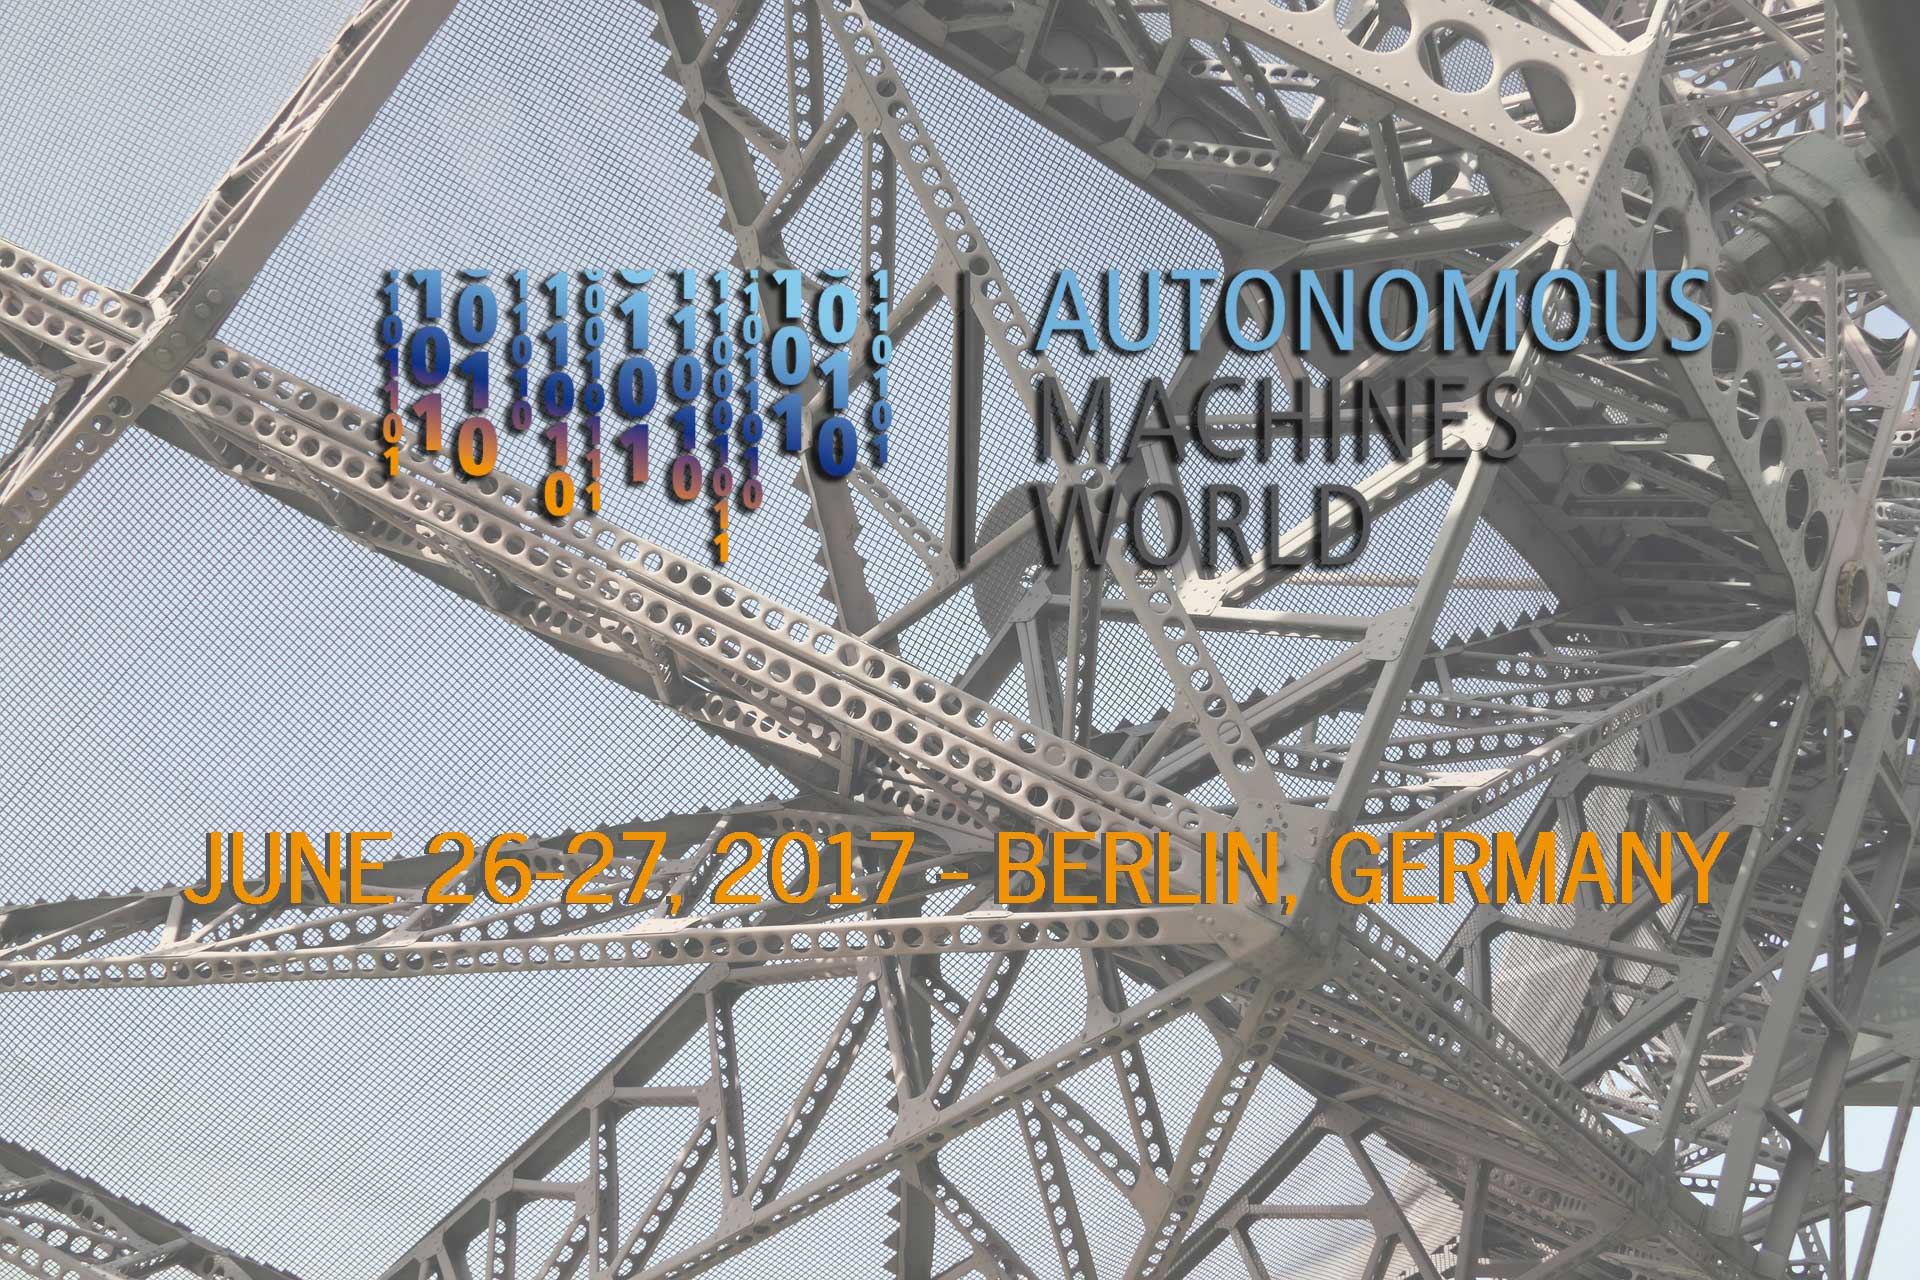 Autonomous Machines World 2017 Industry Event Berlin June 26-27